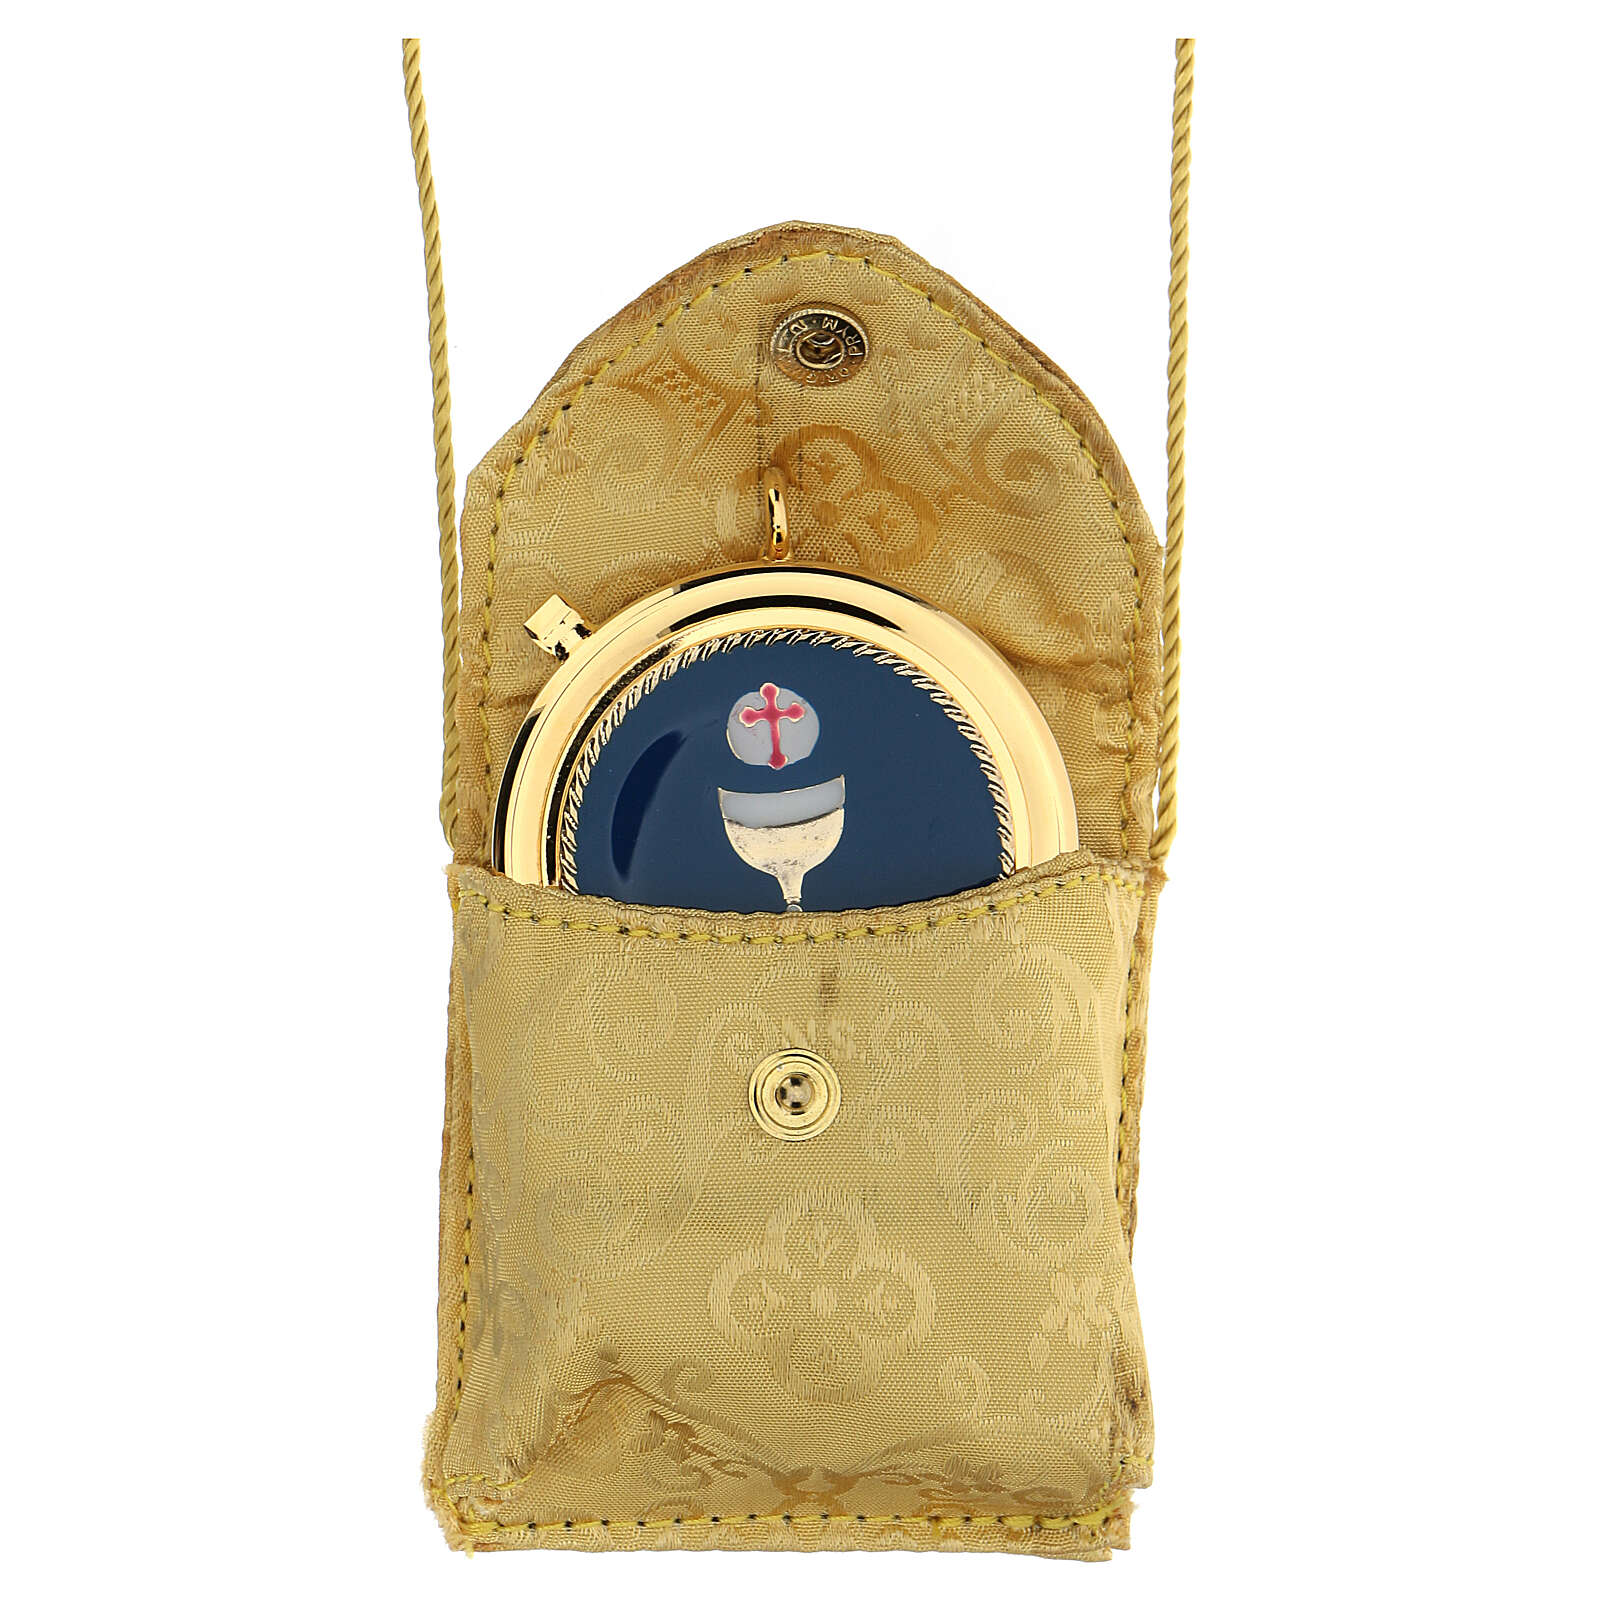 Yellow burse and pyx with Eucharistic decoration 3